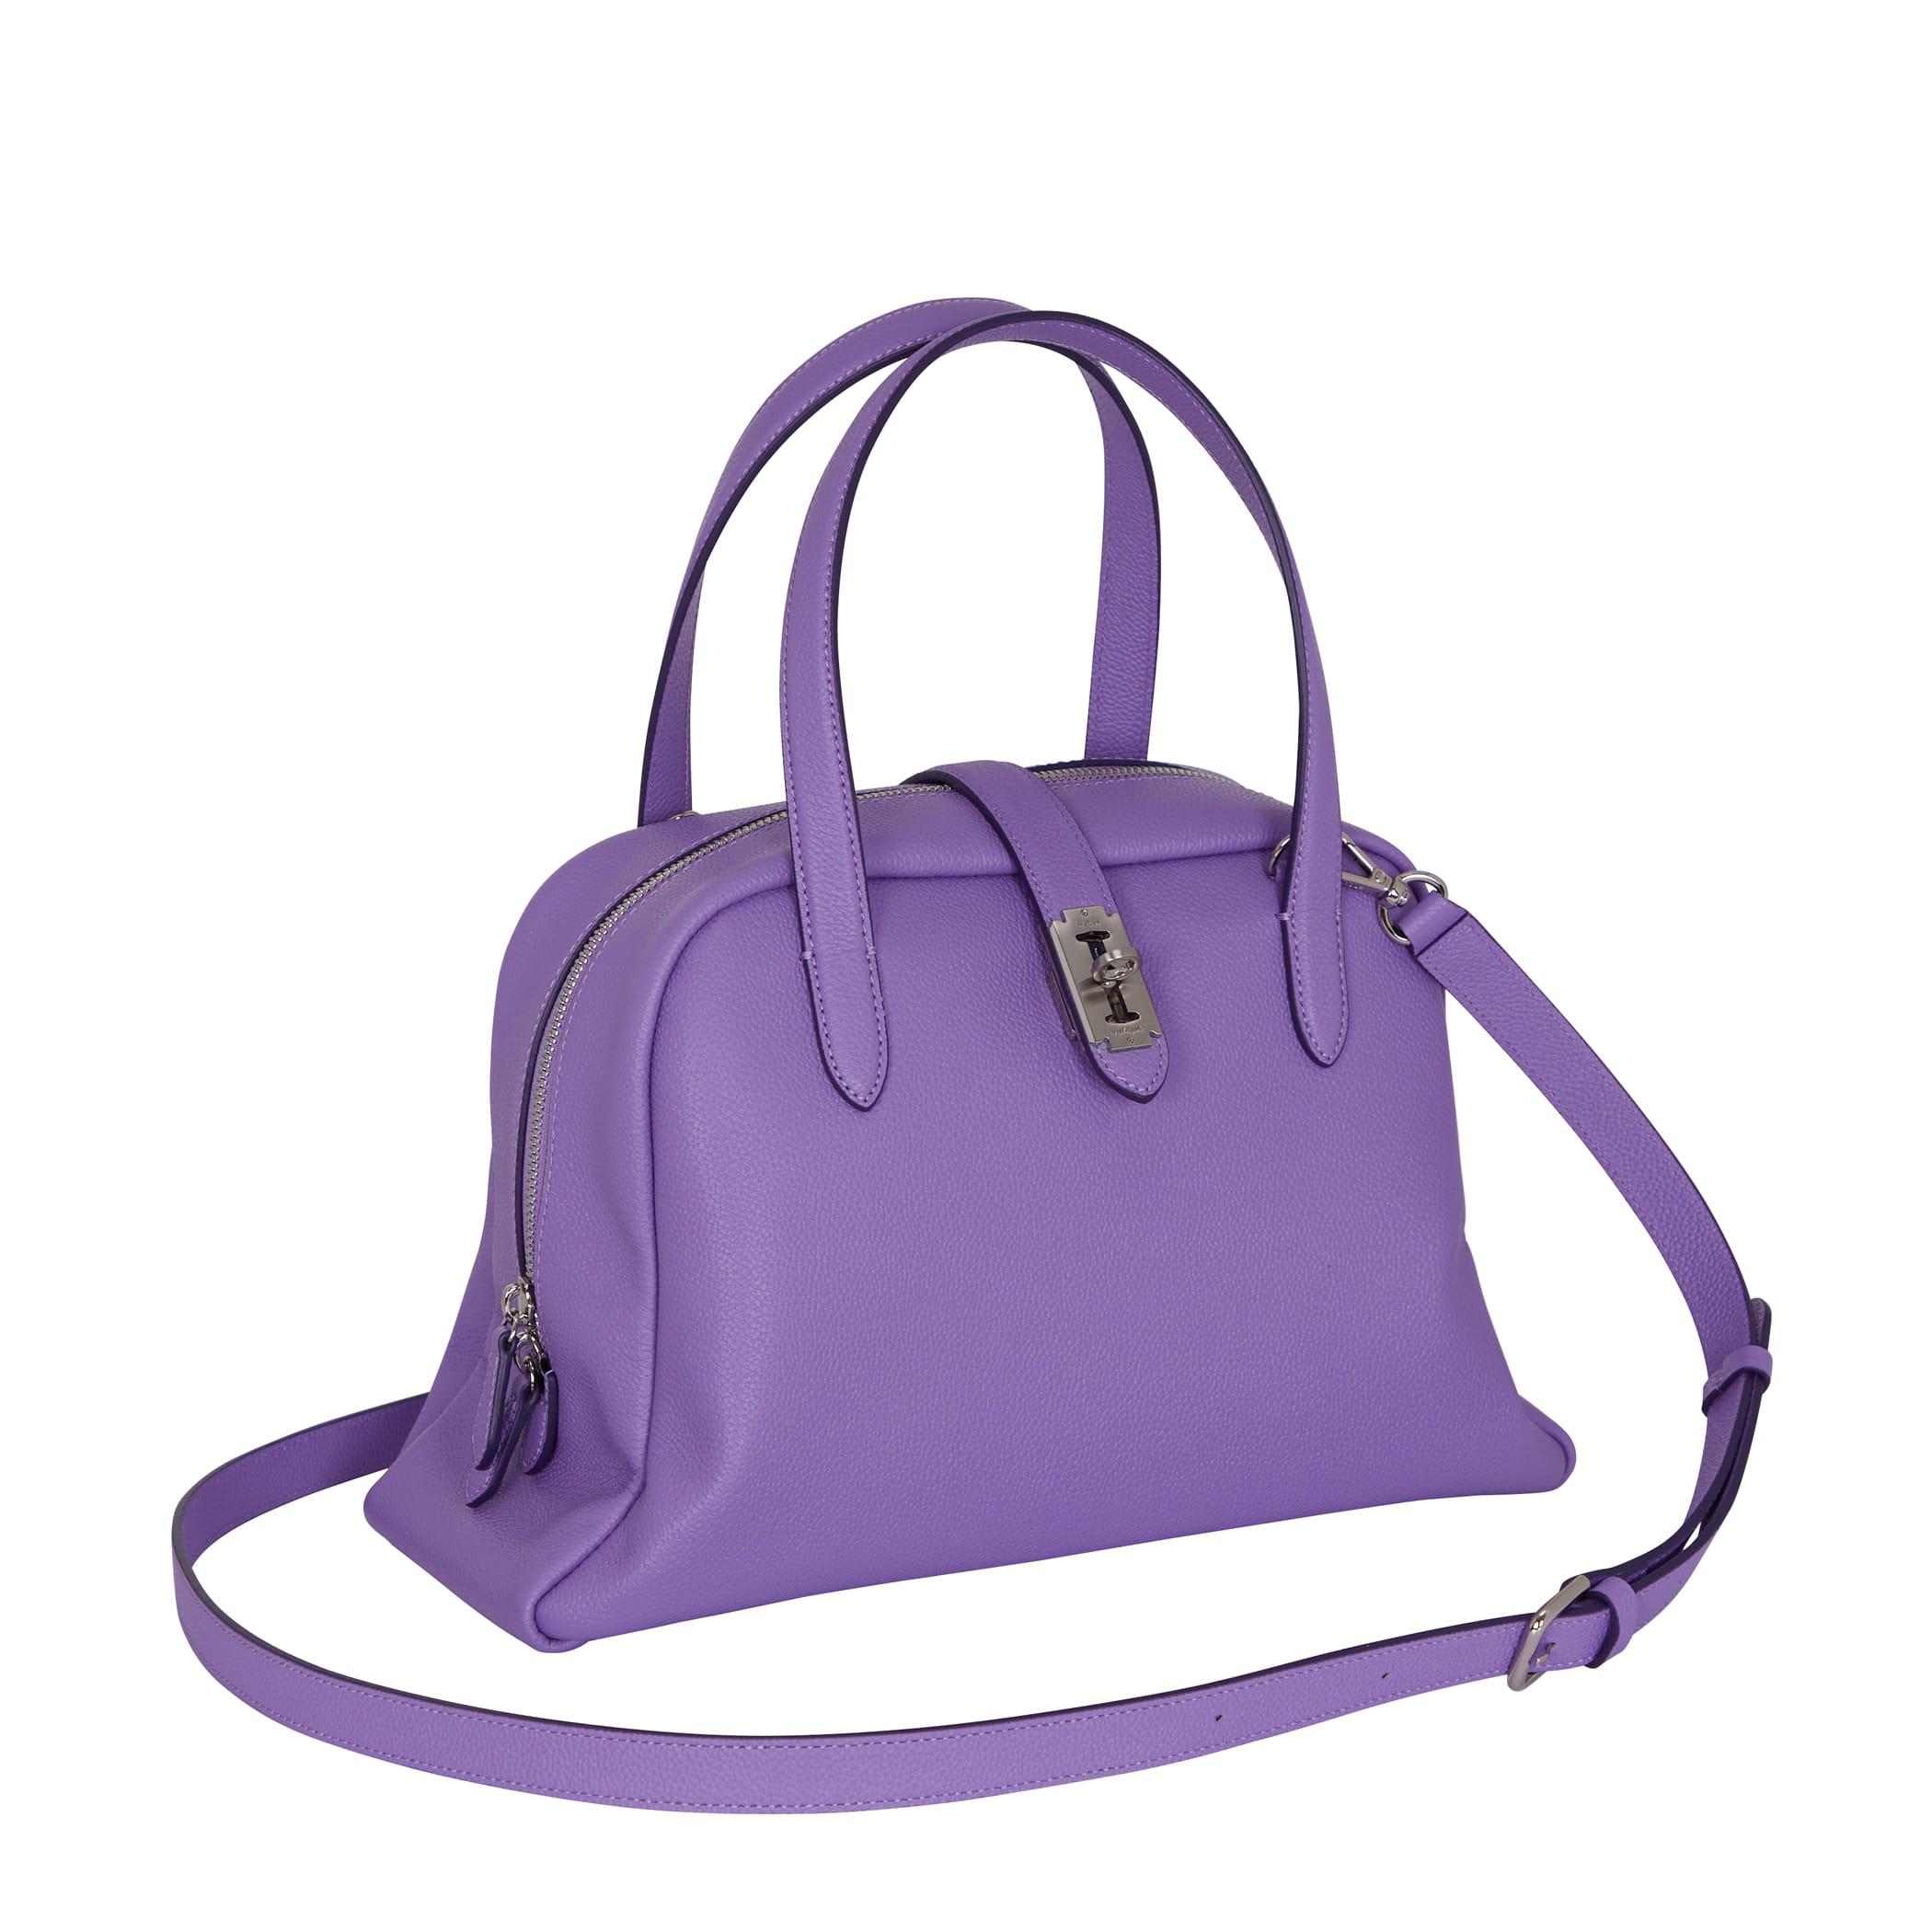 Toque tote M (토크 토트 미듐) Galaxy purple